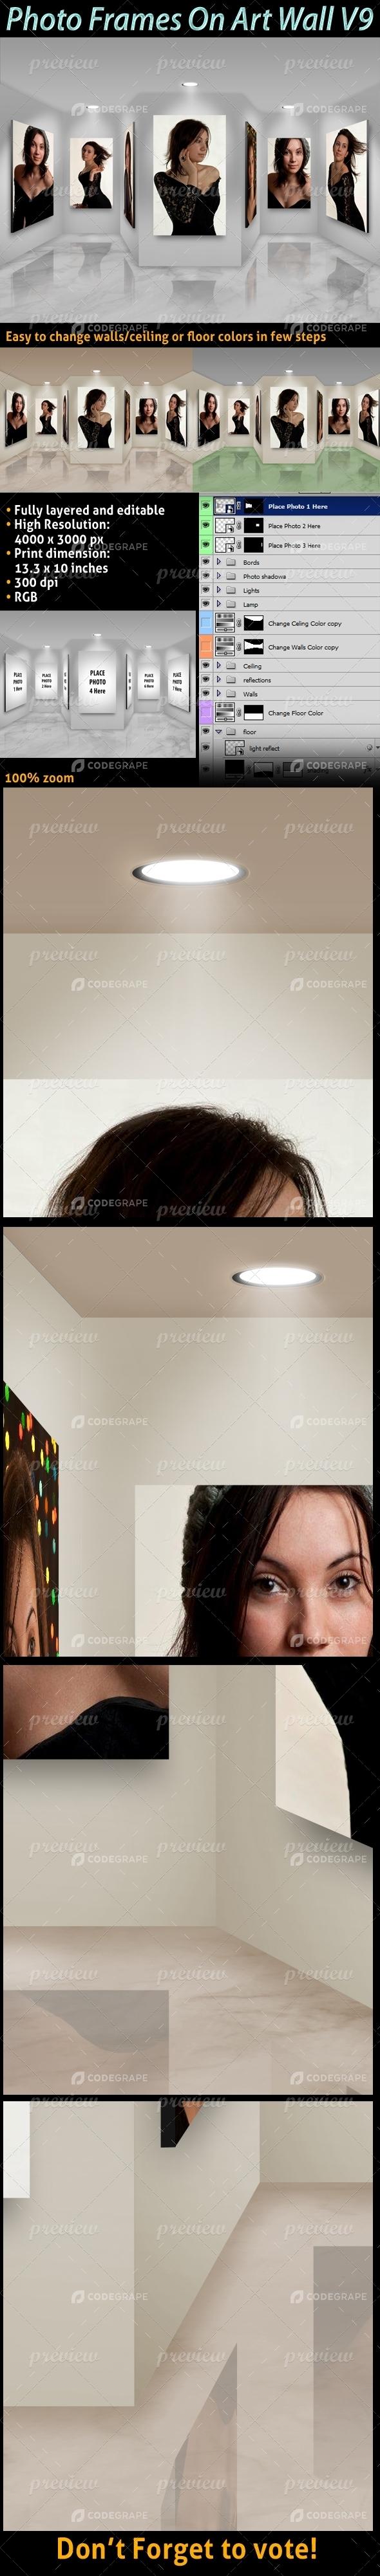 Photo Frames On Art Wall V9